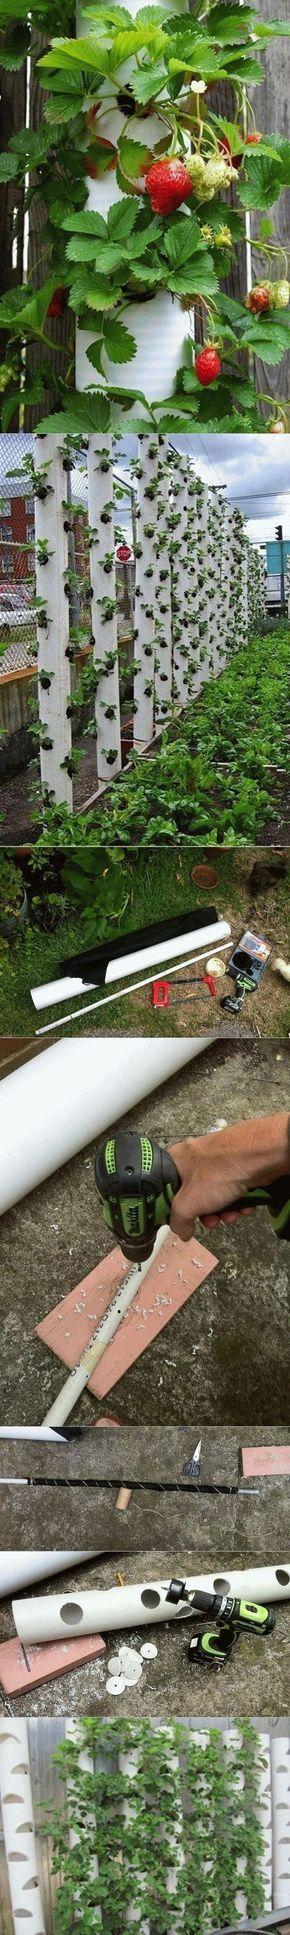 DIY vertical strawberry garden using PVC pipe